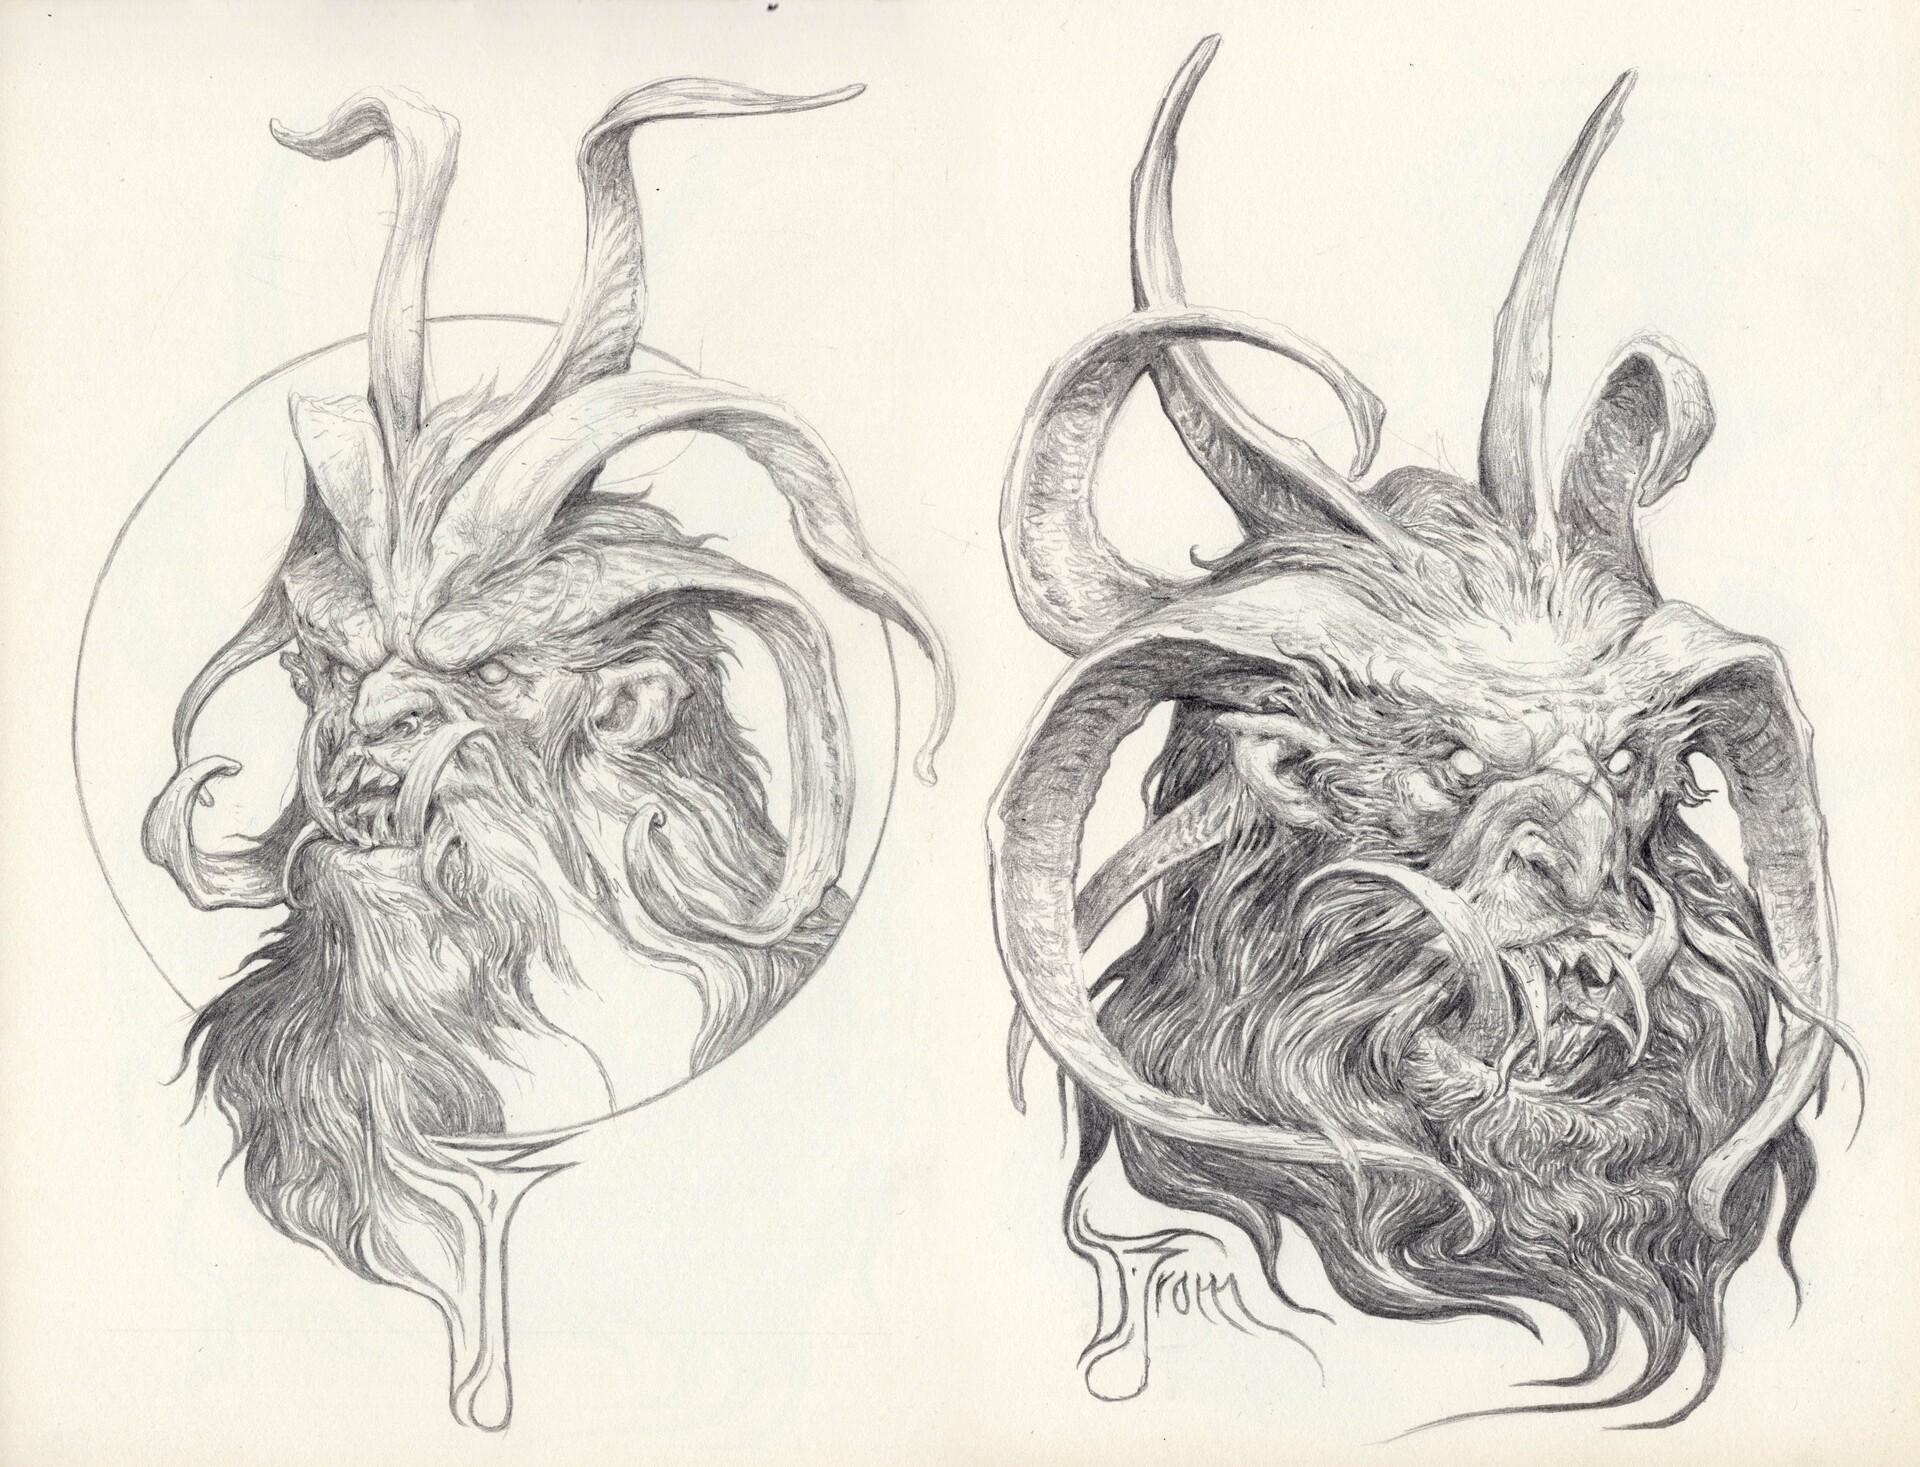 Daniel zrom danielzrom sketchbook13 krampus